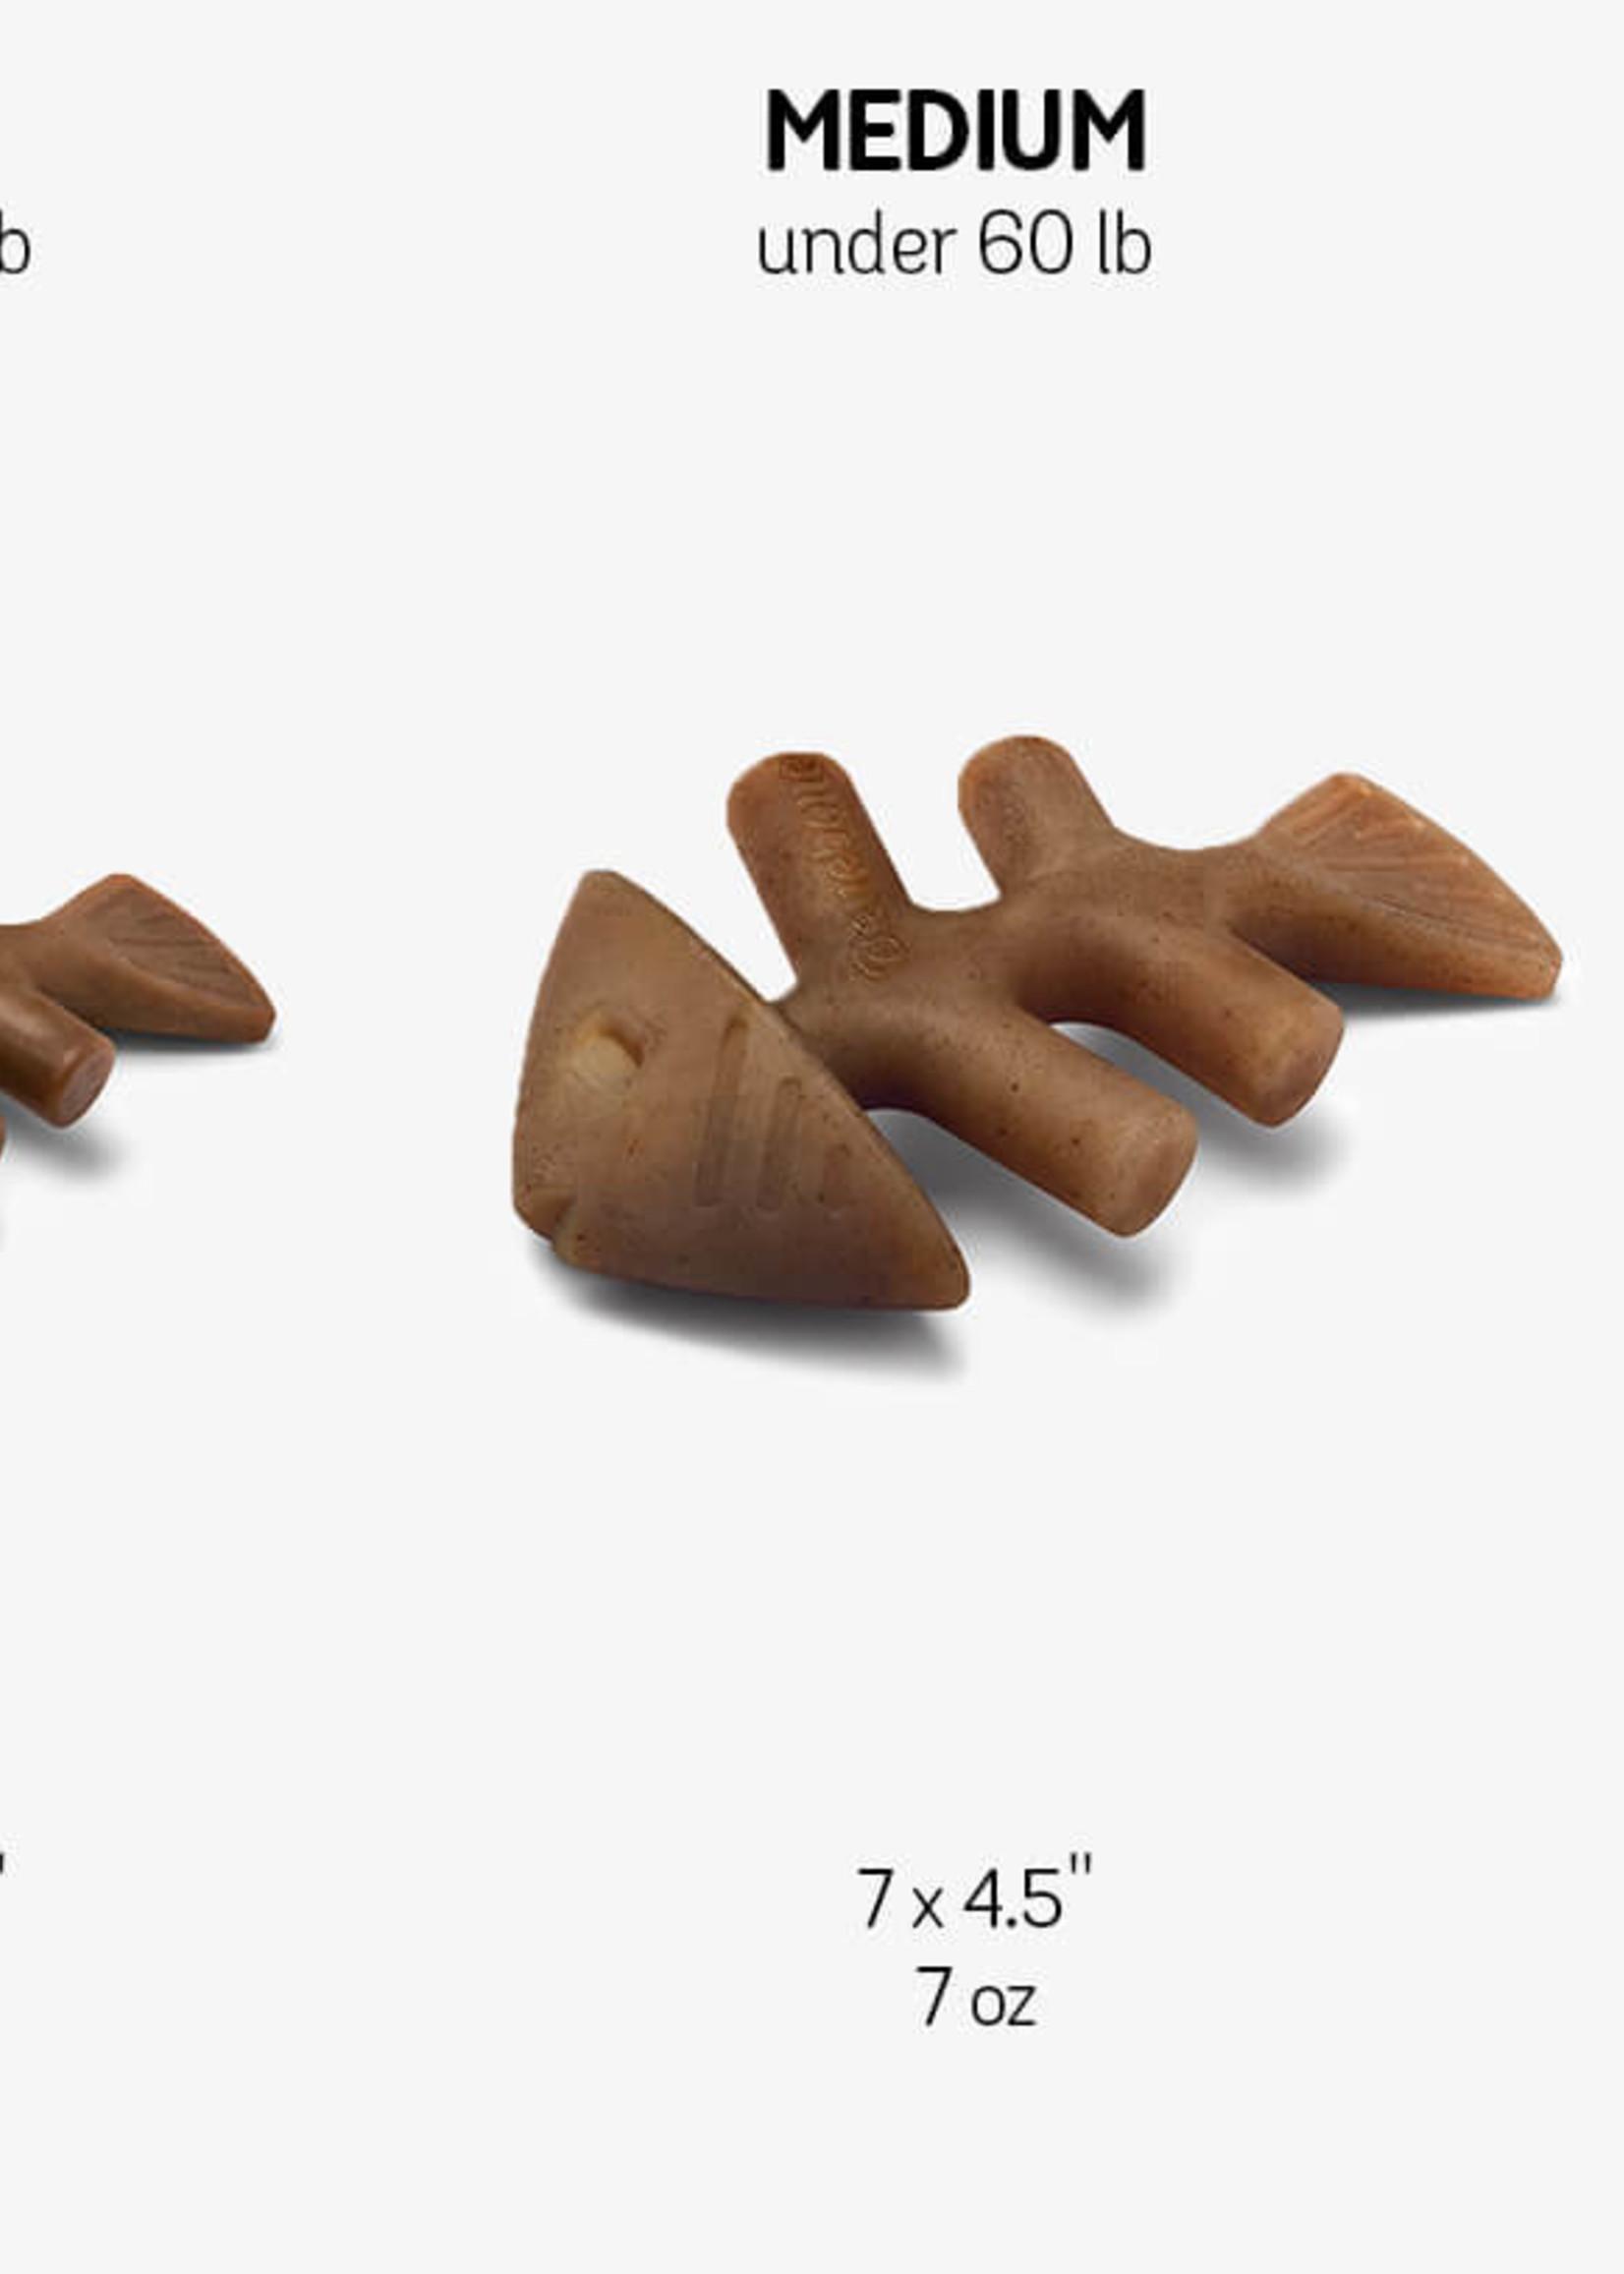 BENEBONE Benebone Fishbone Large